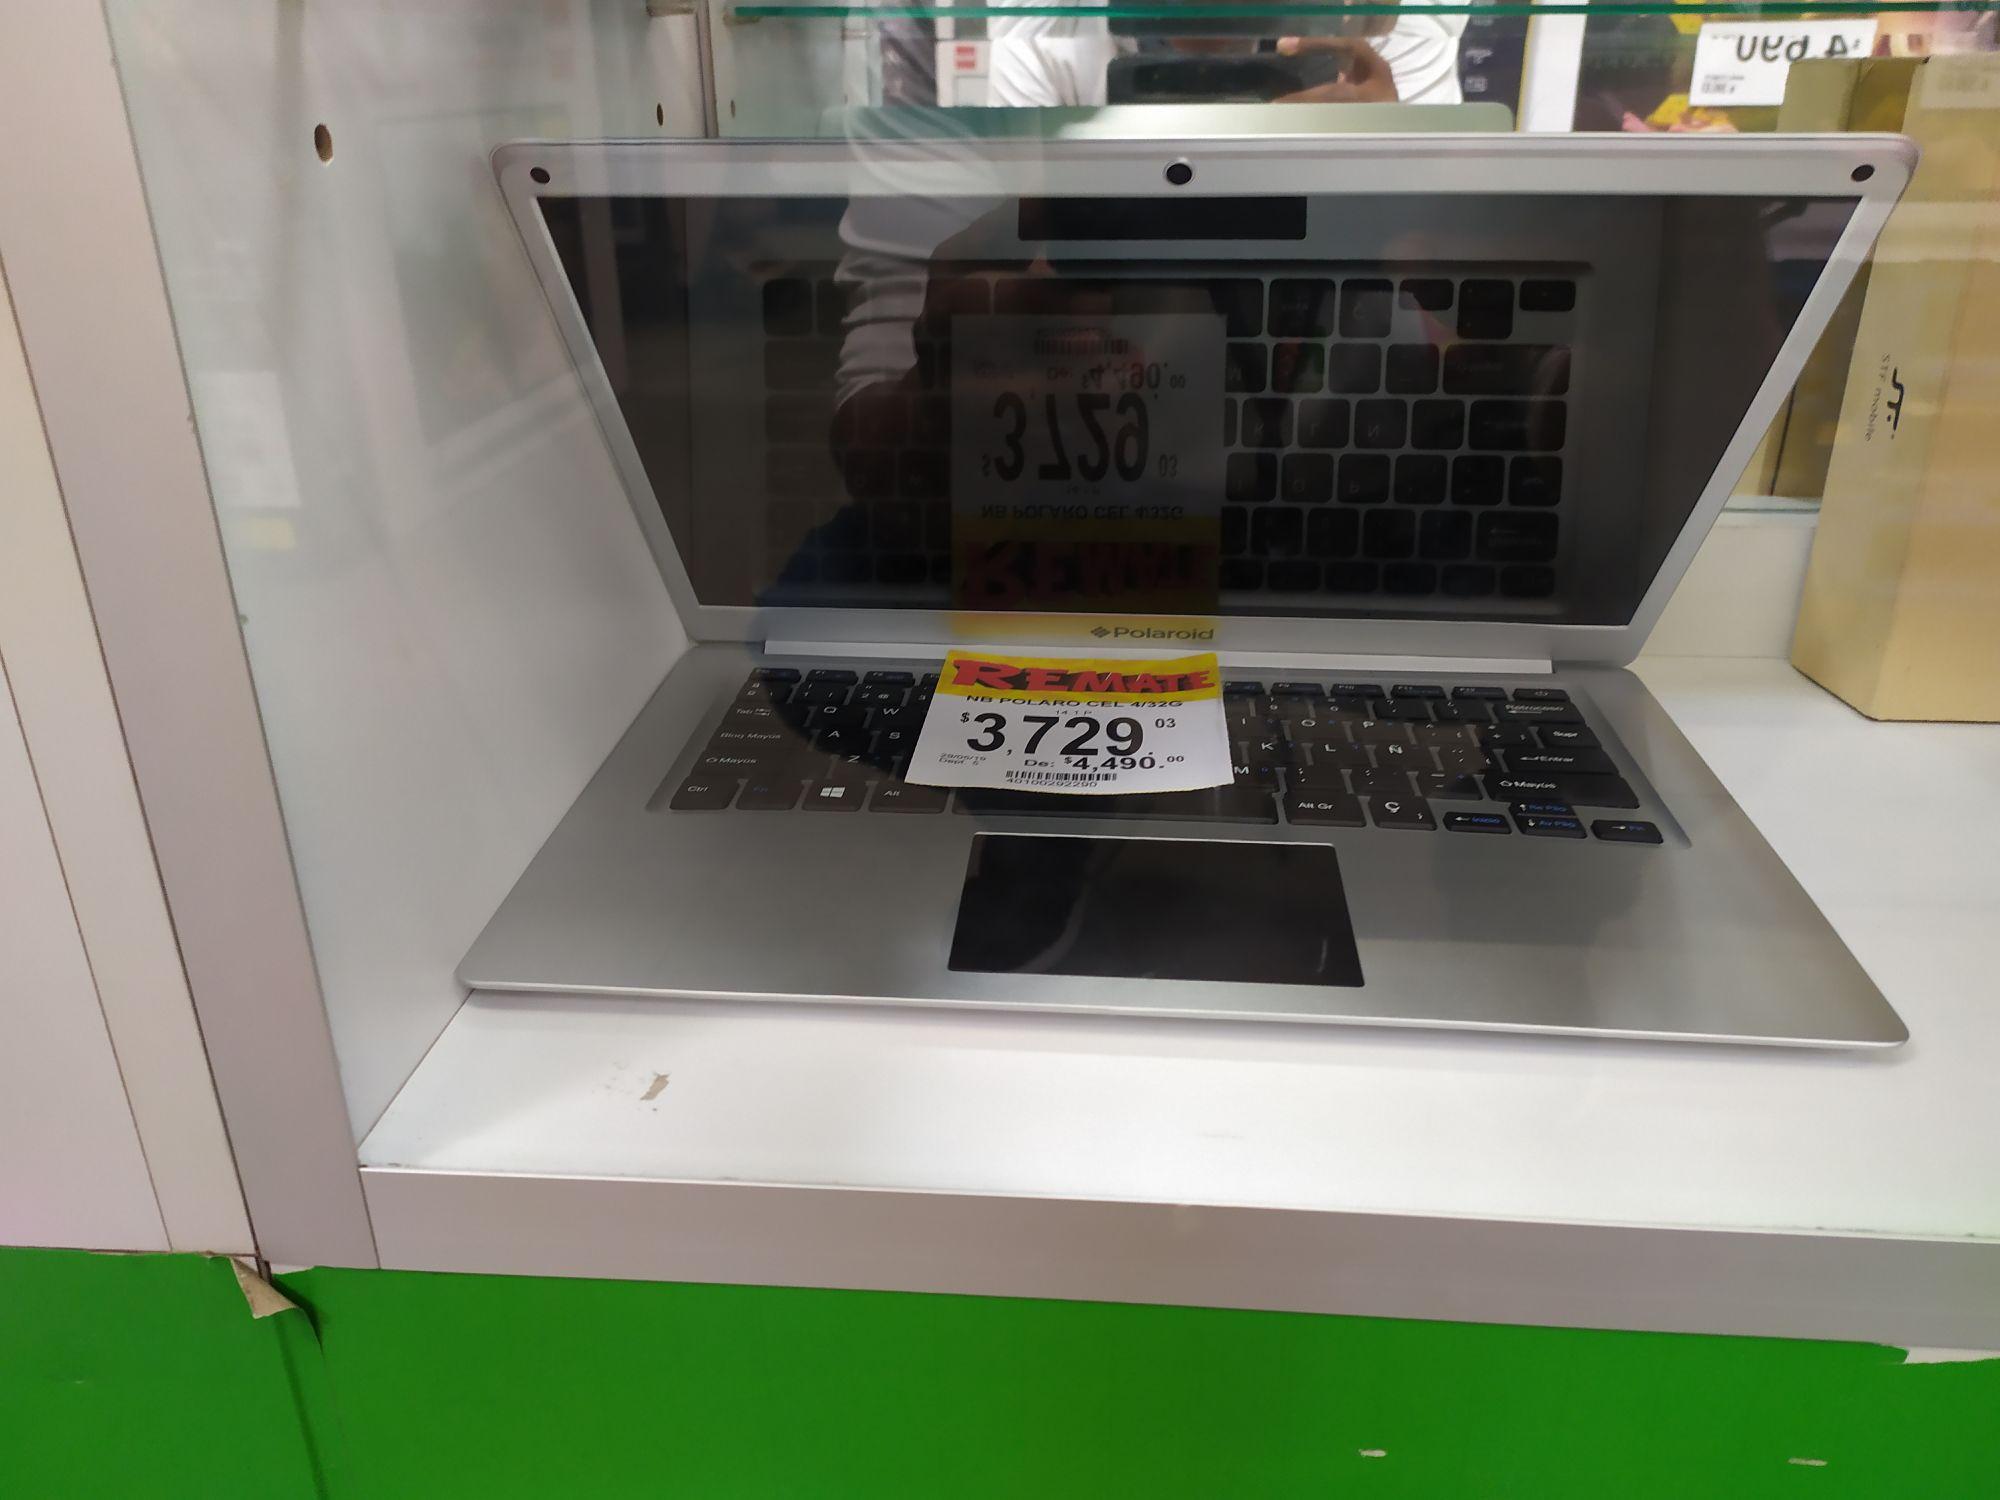 Bodega Aurrerá: Celular Polarod y Laptops desde $3729 pesitos